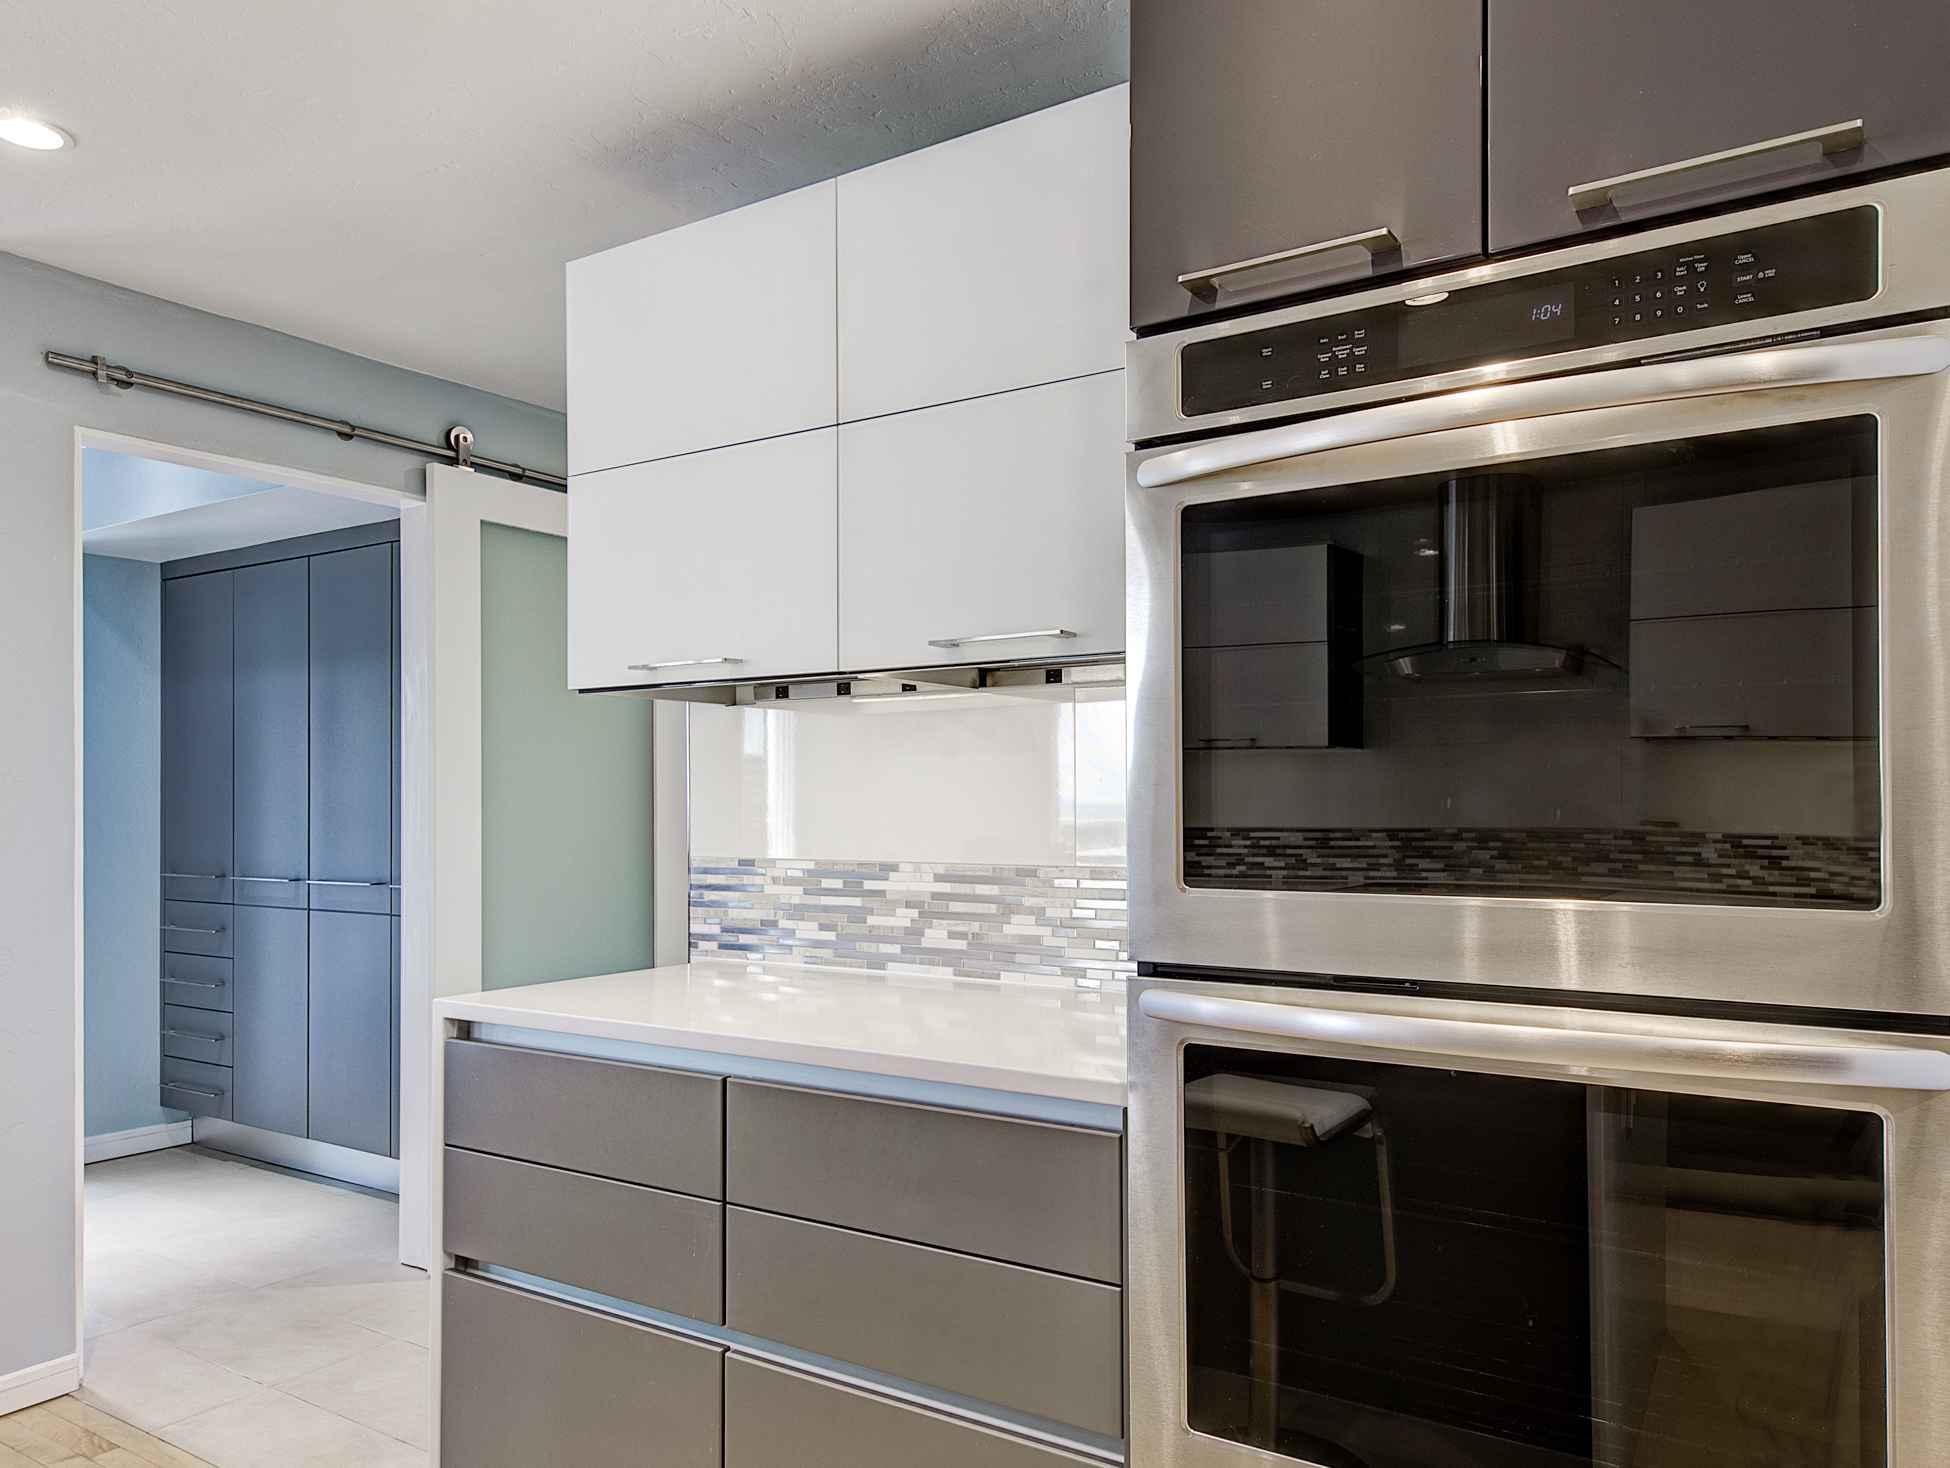 boulder modern — sanctuary kitchen and bath design.jpg